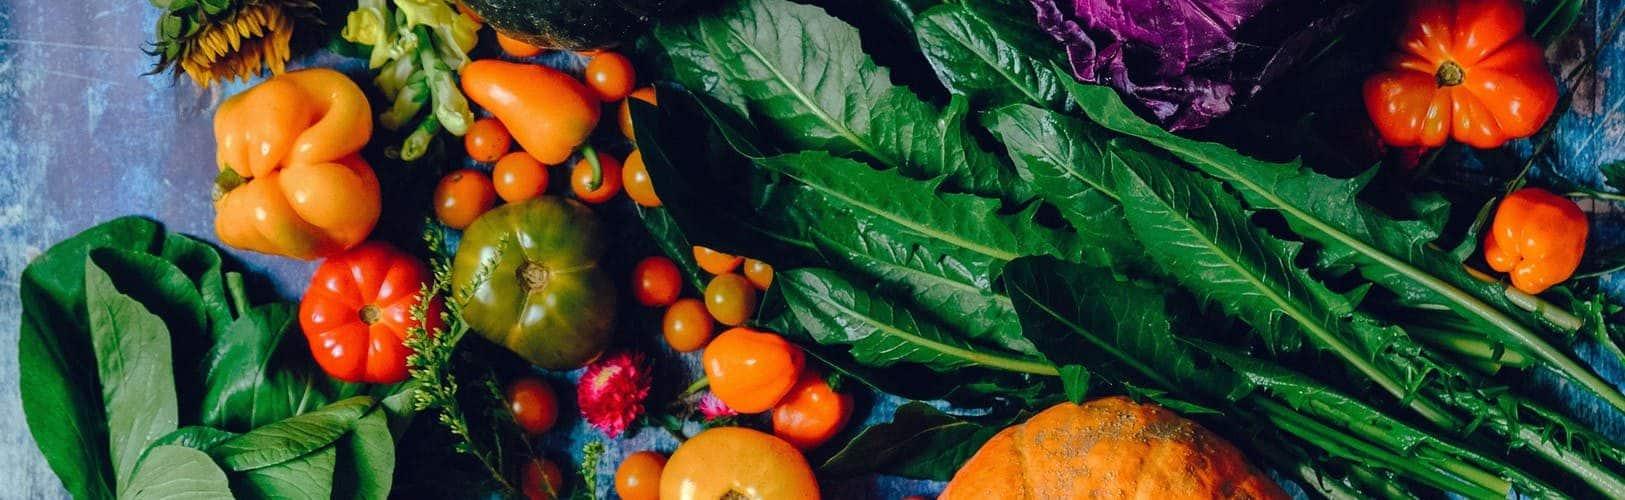 growing food worth it